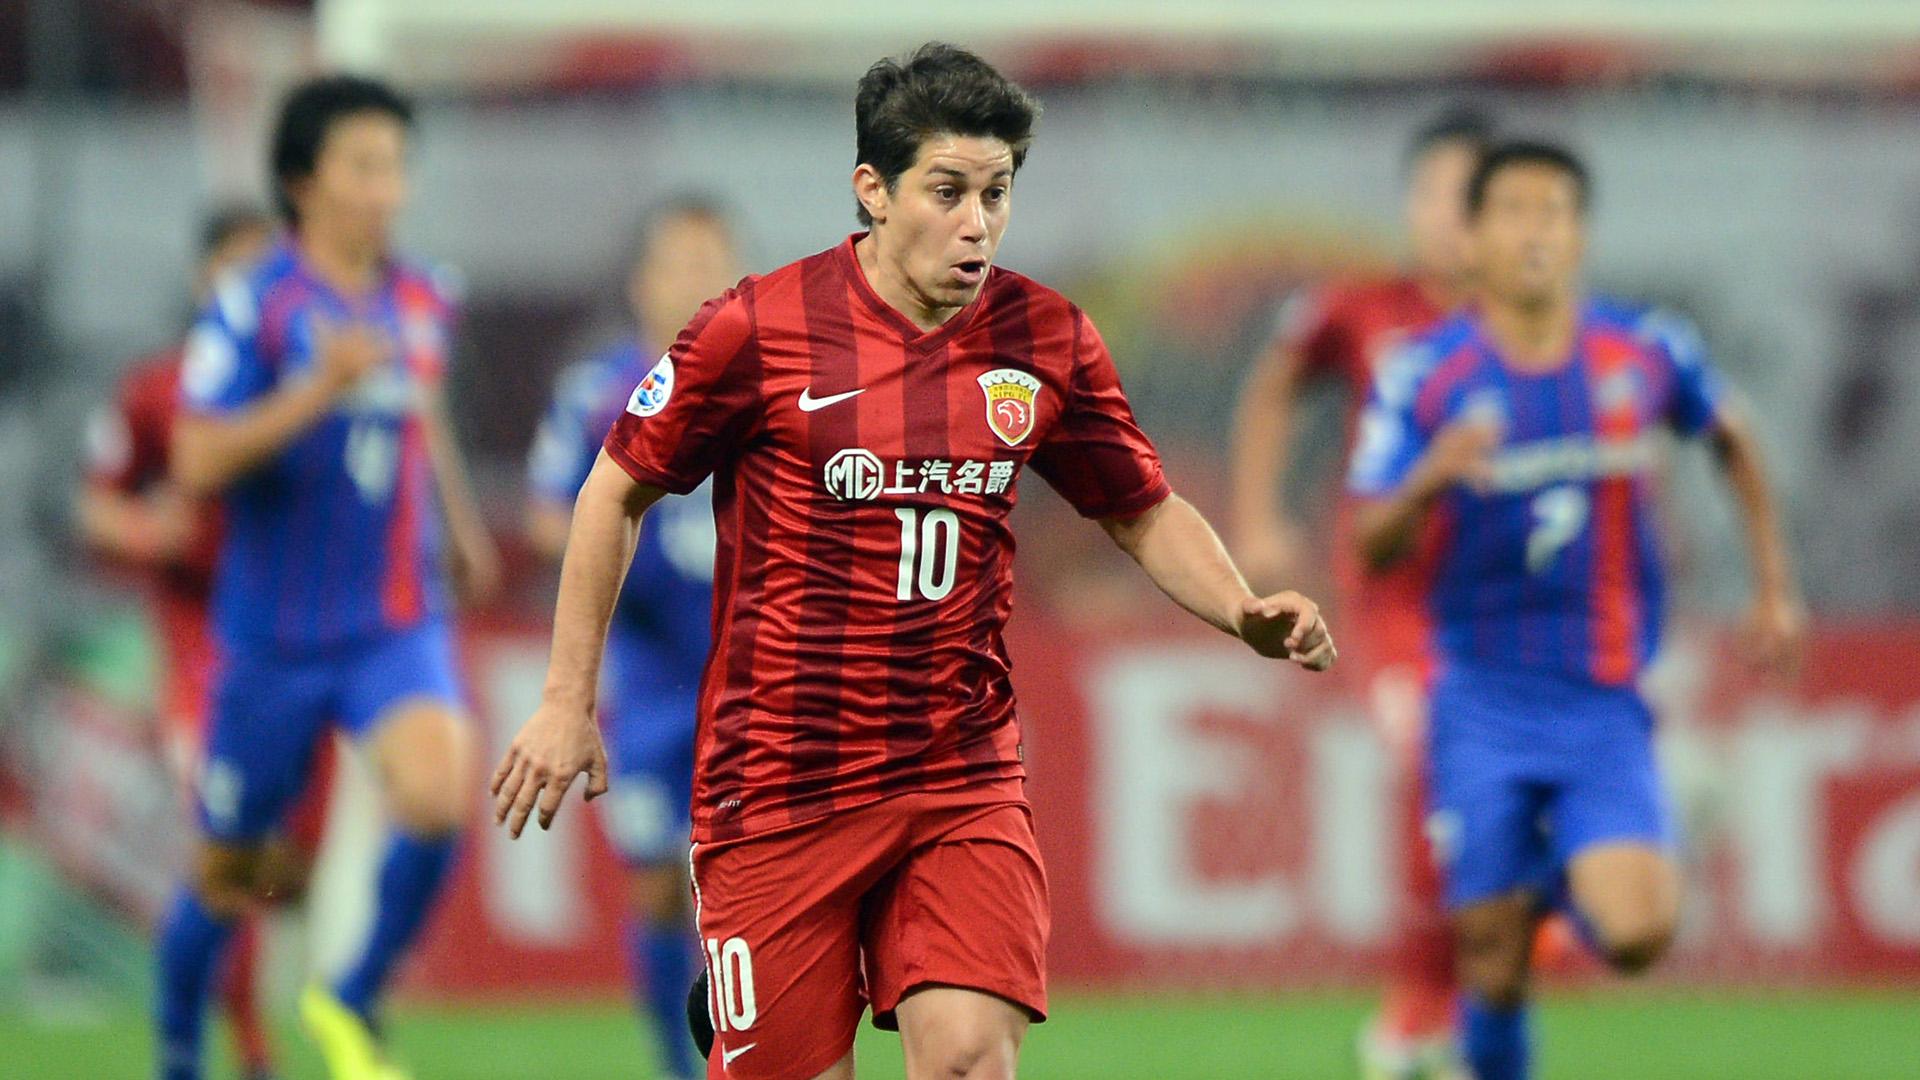 Dario Conca Shanghai SIPG AFC Champions League 24052016